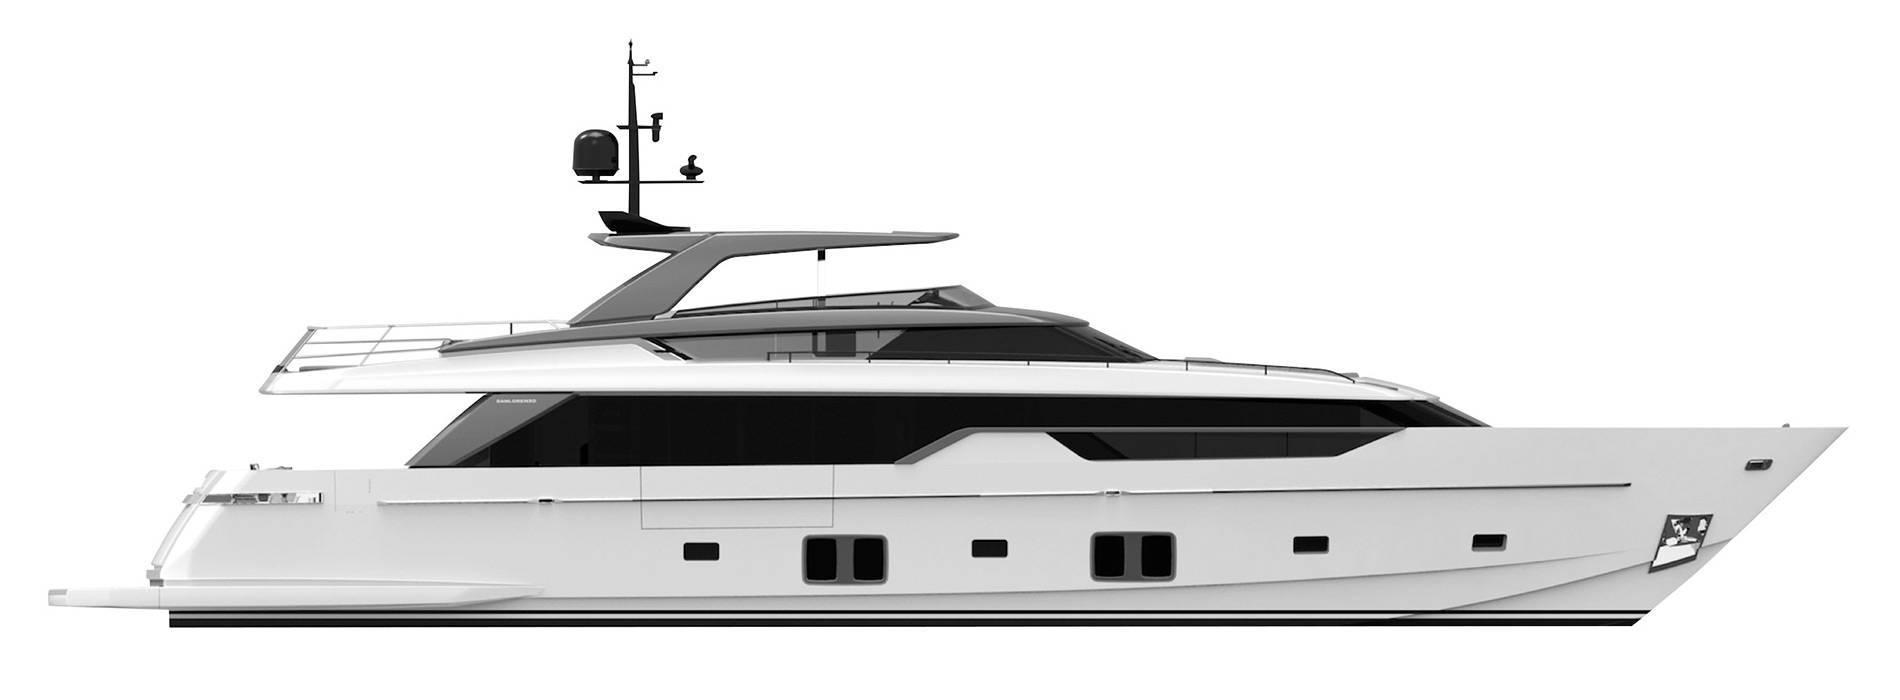 Sanlorenzo Yachts SL102 Профиль